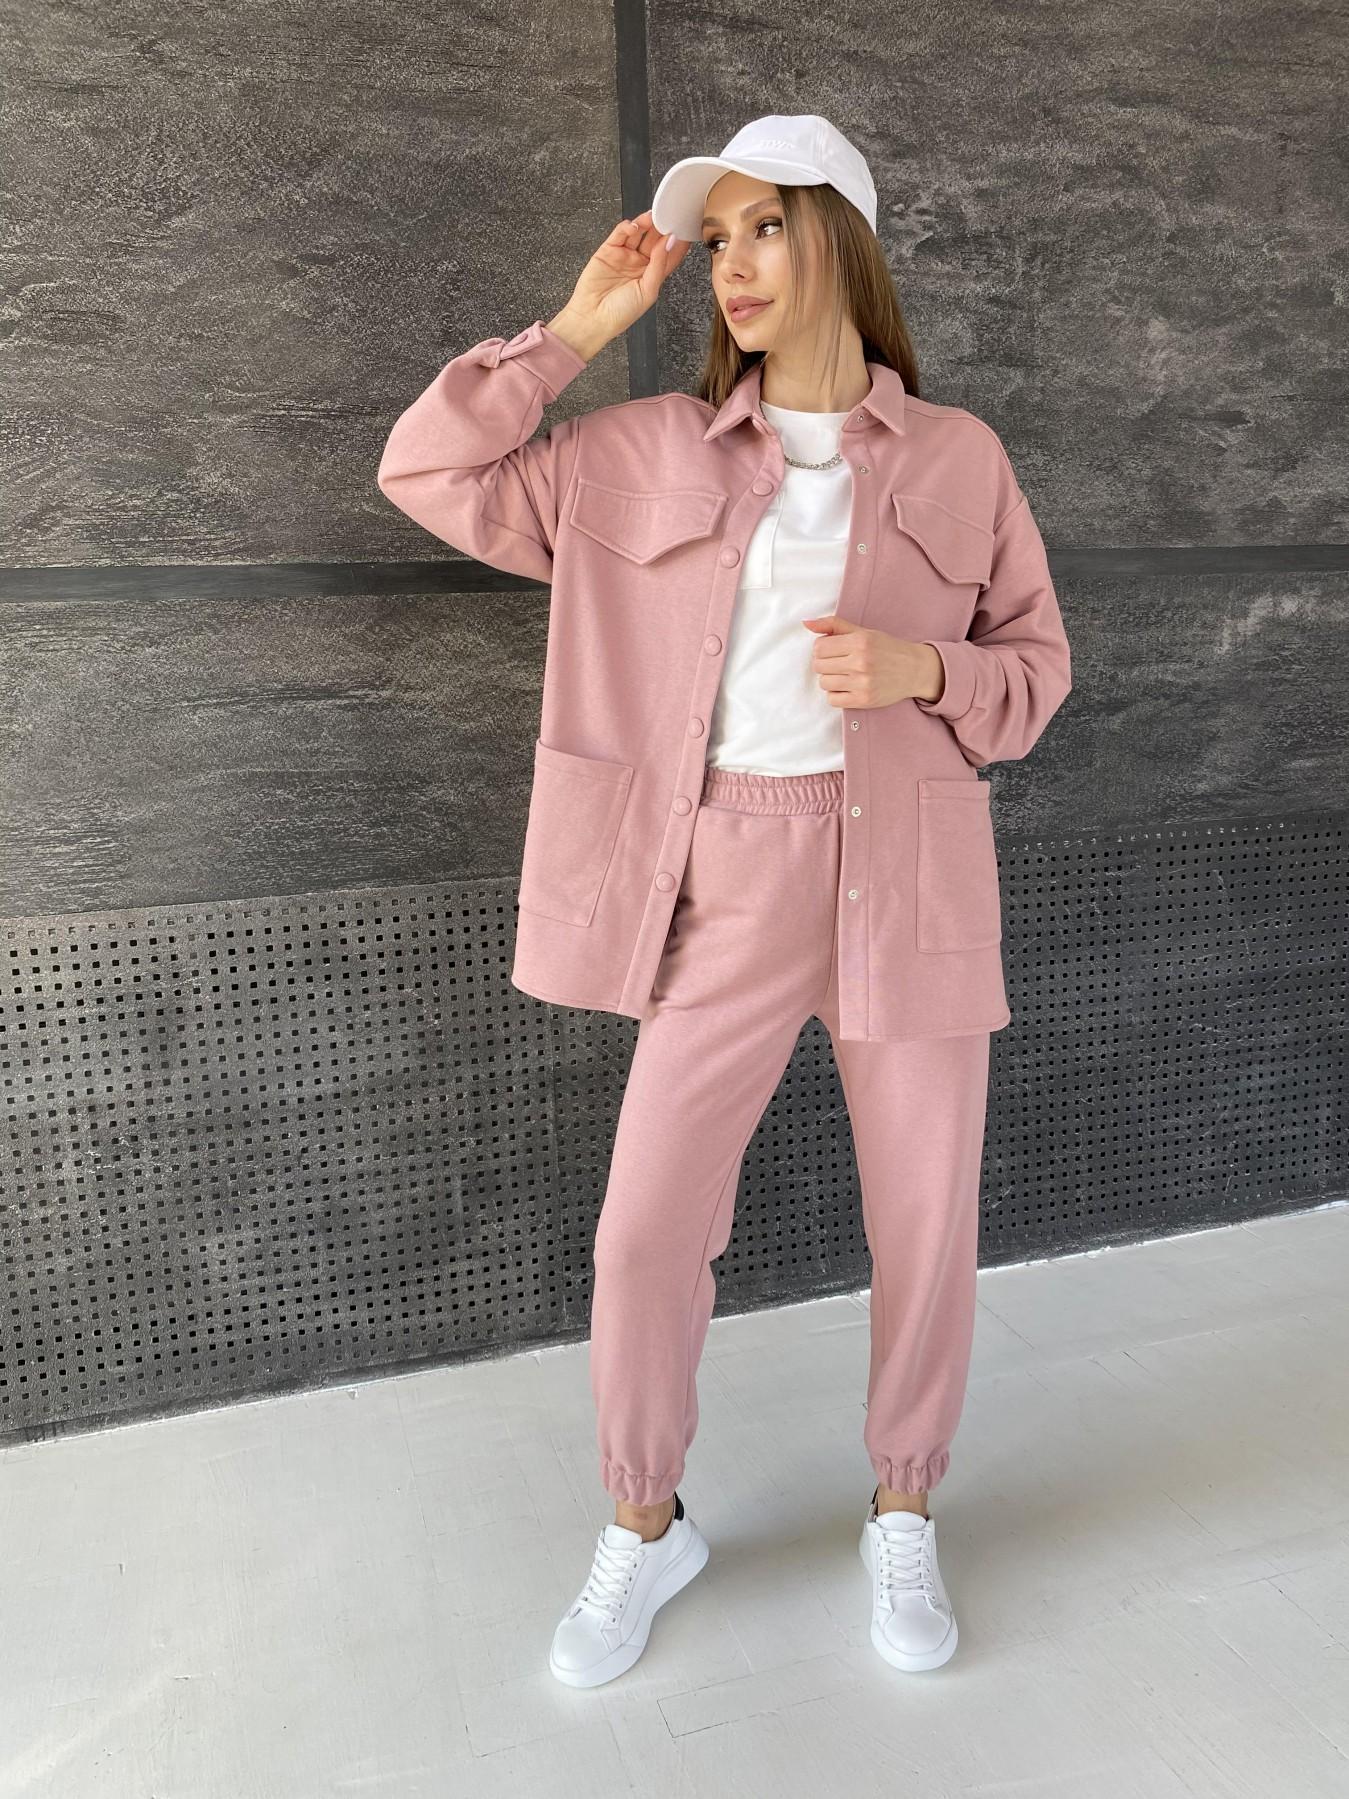 Респект костюм из трикотажа  3х нитка 11055 АРТ. 47574 Цвет: Пудра - фото 5, интернет магазин tm-modus.ru